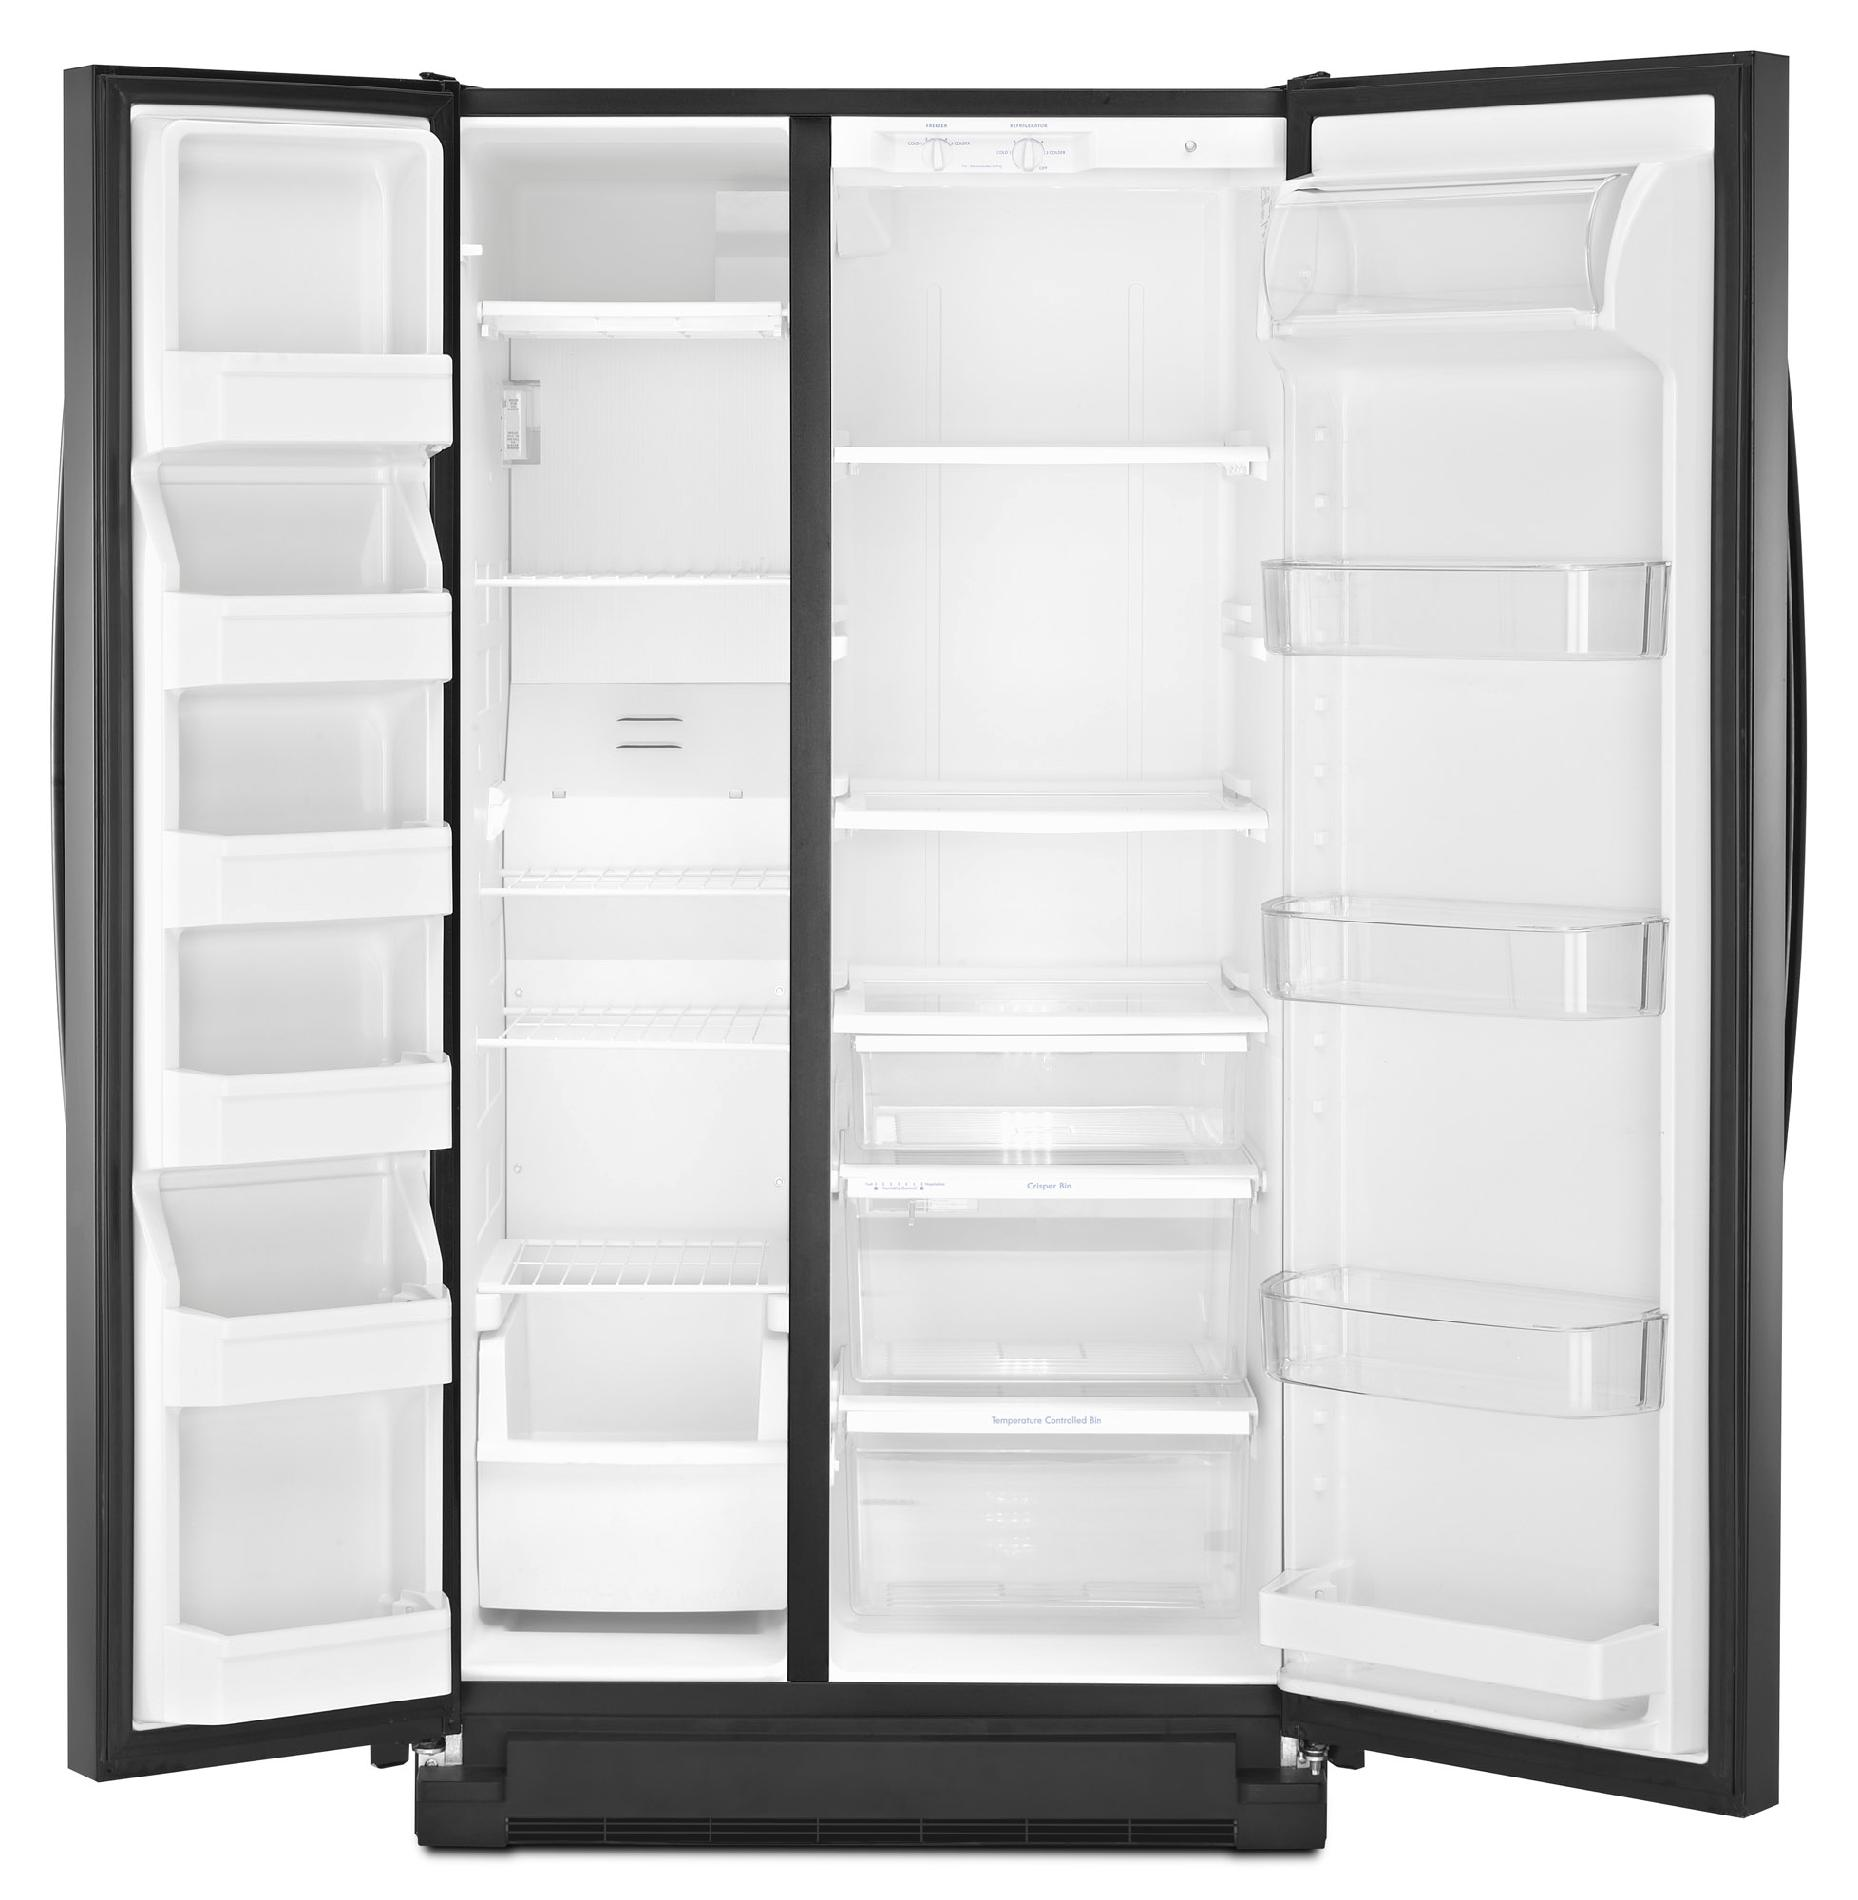 Kenmore 41159 25 cu. ft. Side-by-Side Refrigerator - Black